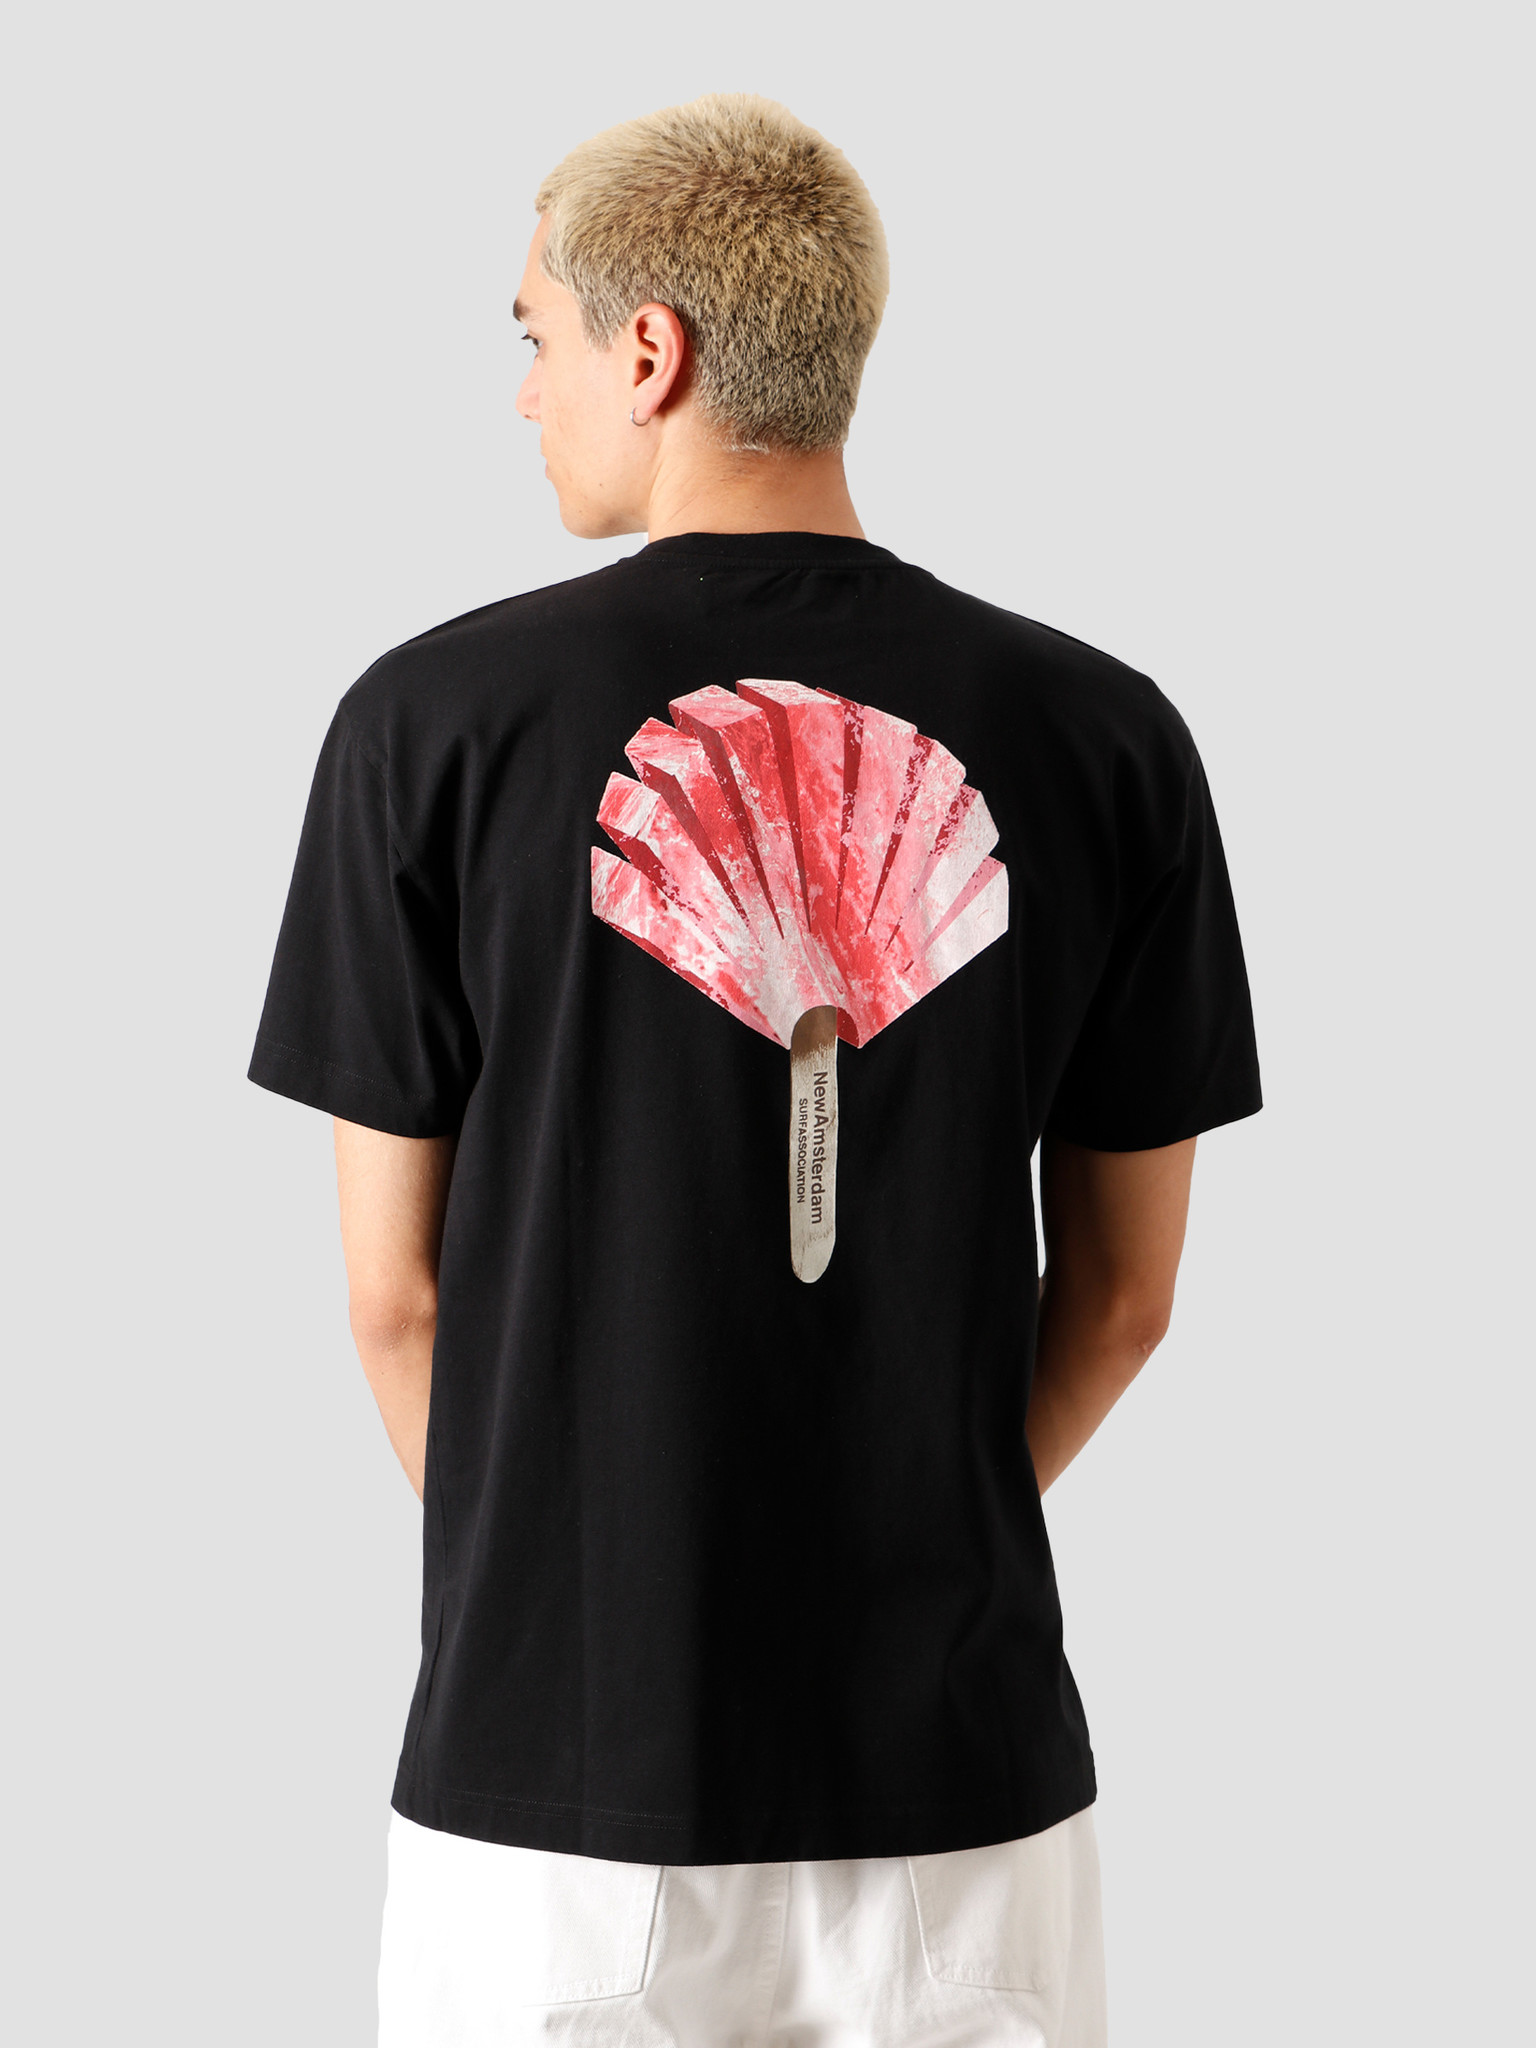 New Amsterdam Surf association New Amsterdam Surf association Ice T-Shirt Black 2020010